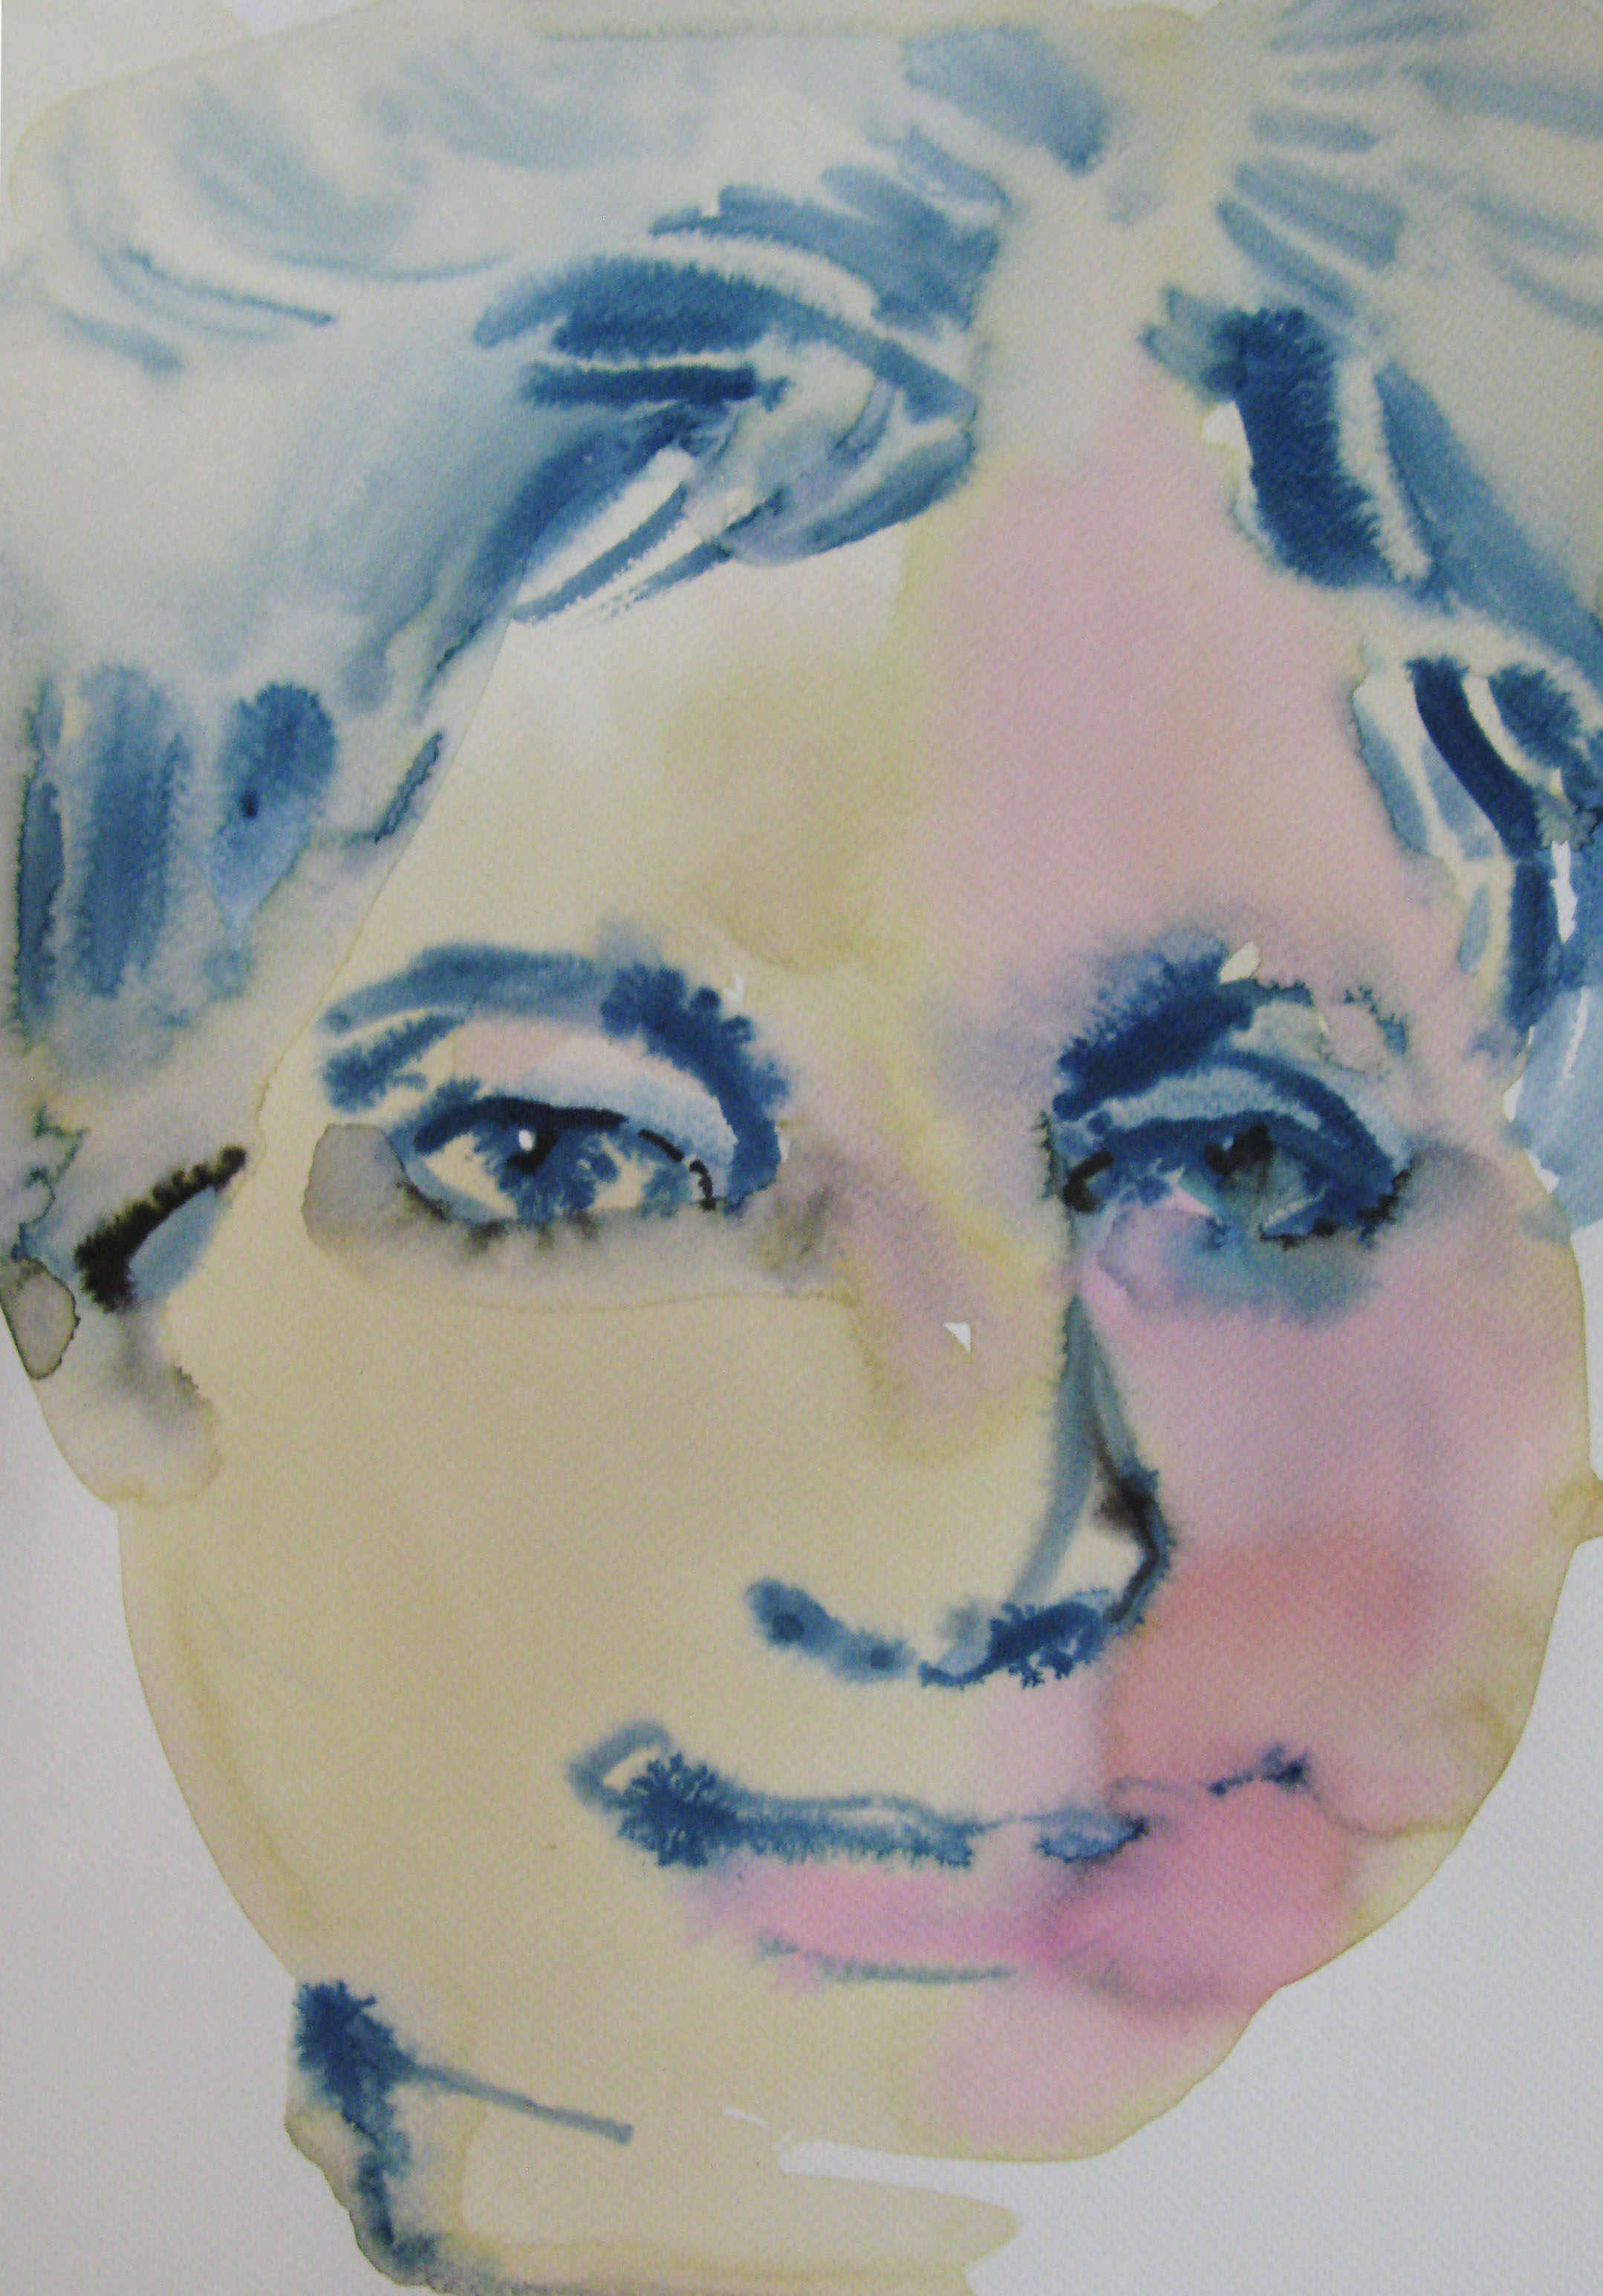 Zdenka, 42x29.7cm  watercolour, ink on paper  2019